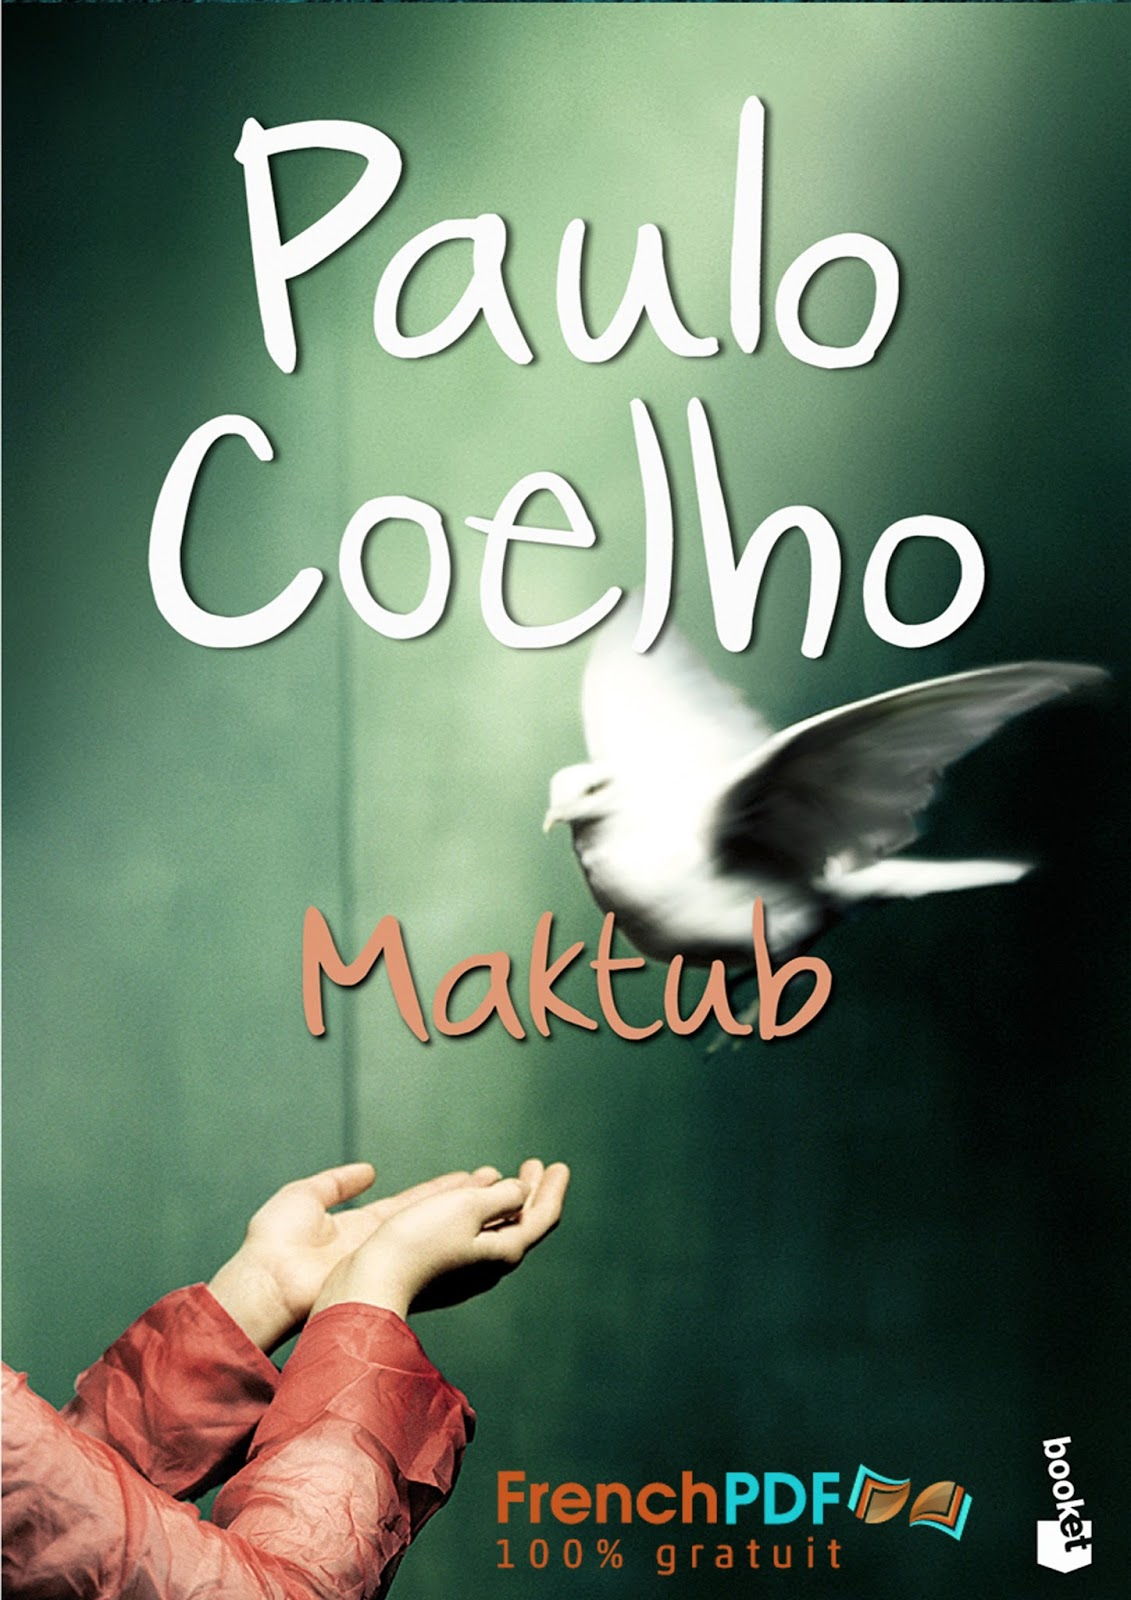 maktub paulo coelho pdf gratuit